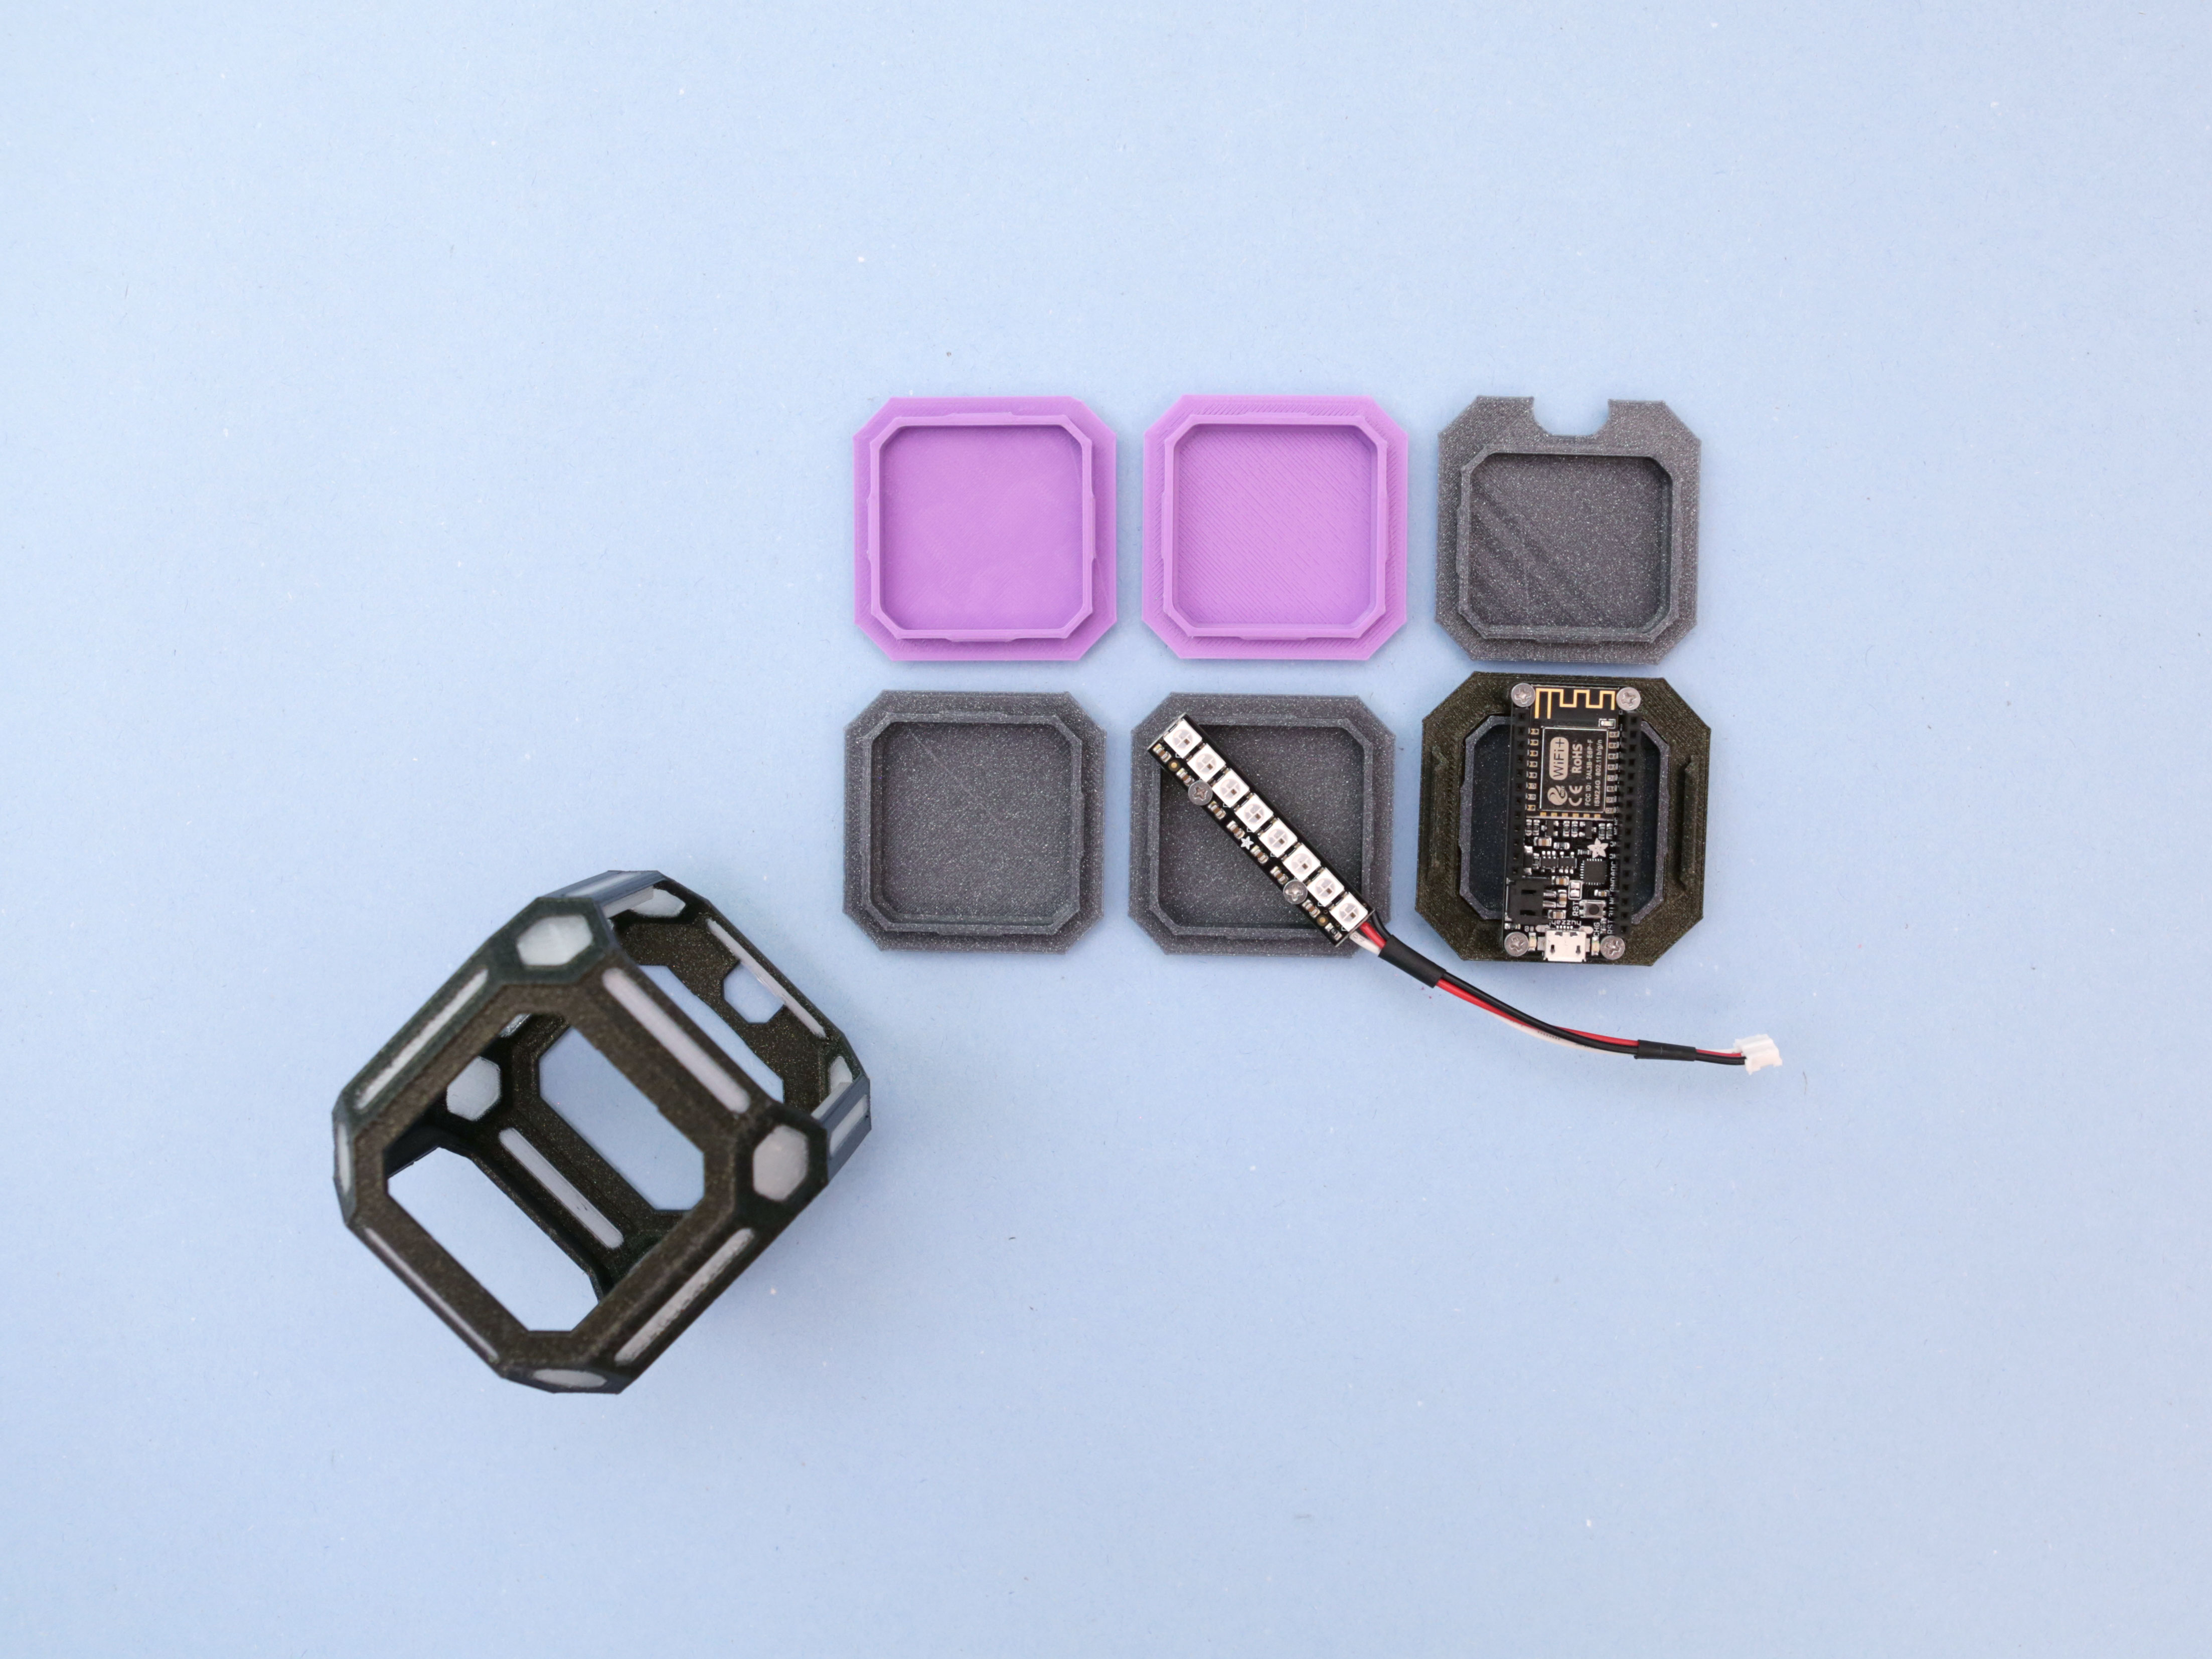 adafruit_io_cube-panels-preinstall.jpg